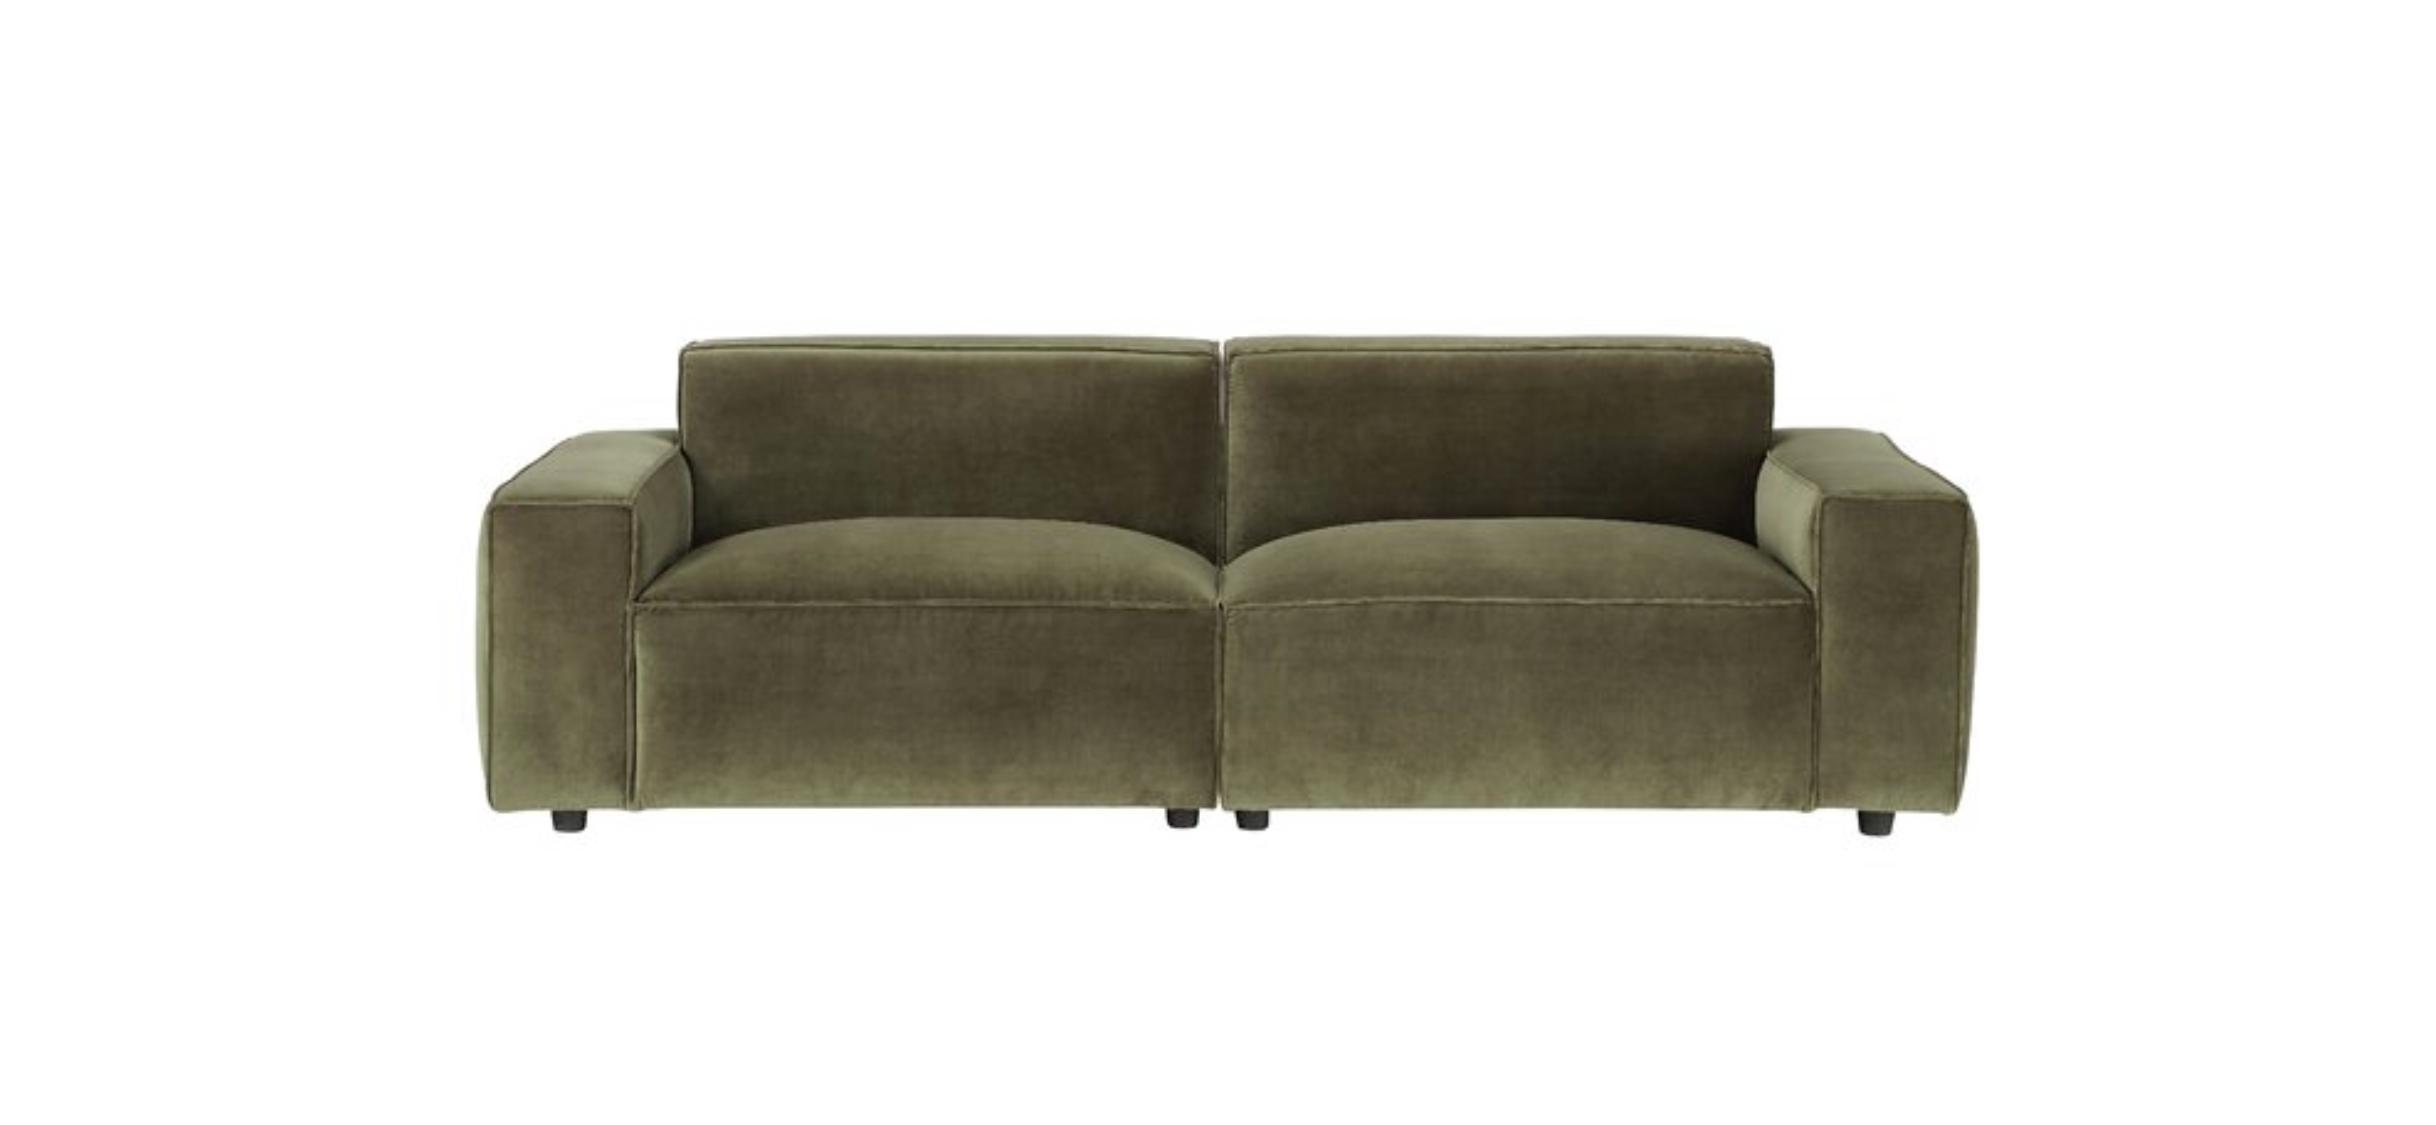 raymour bobby berk sofa.png